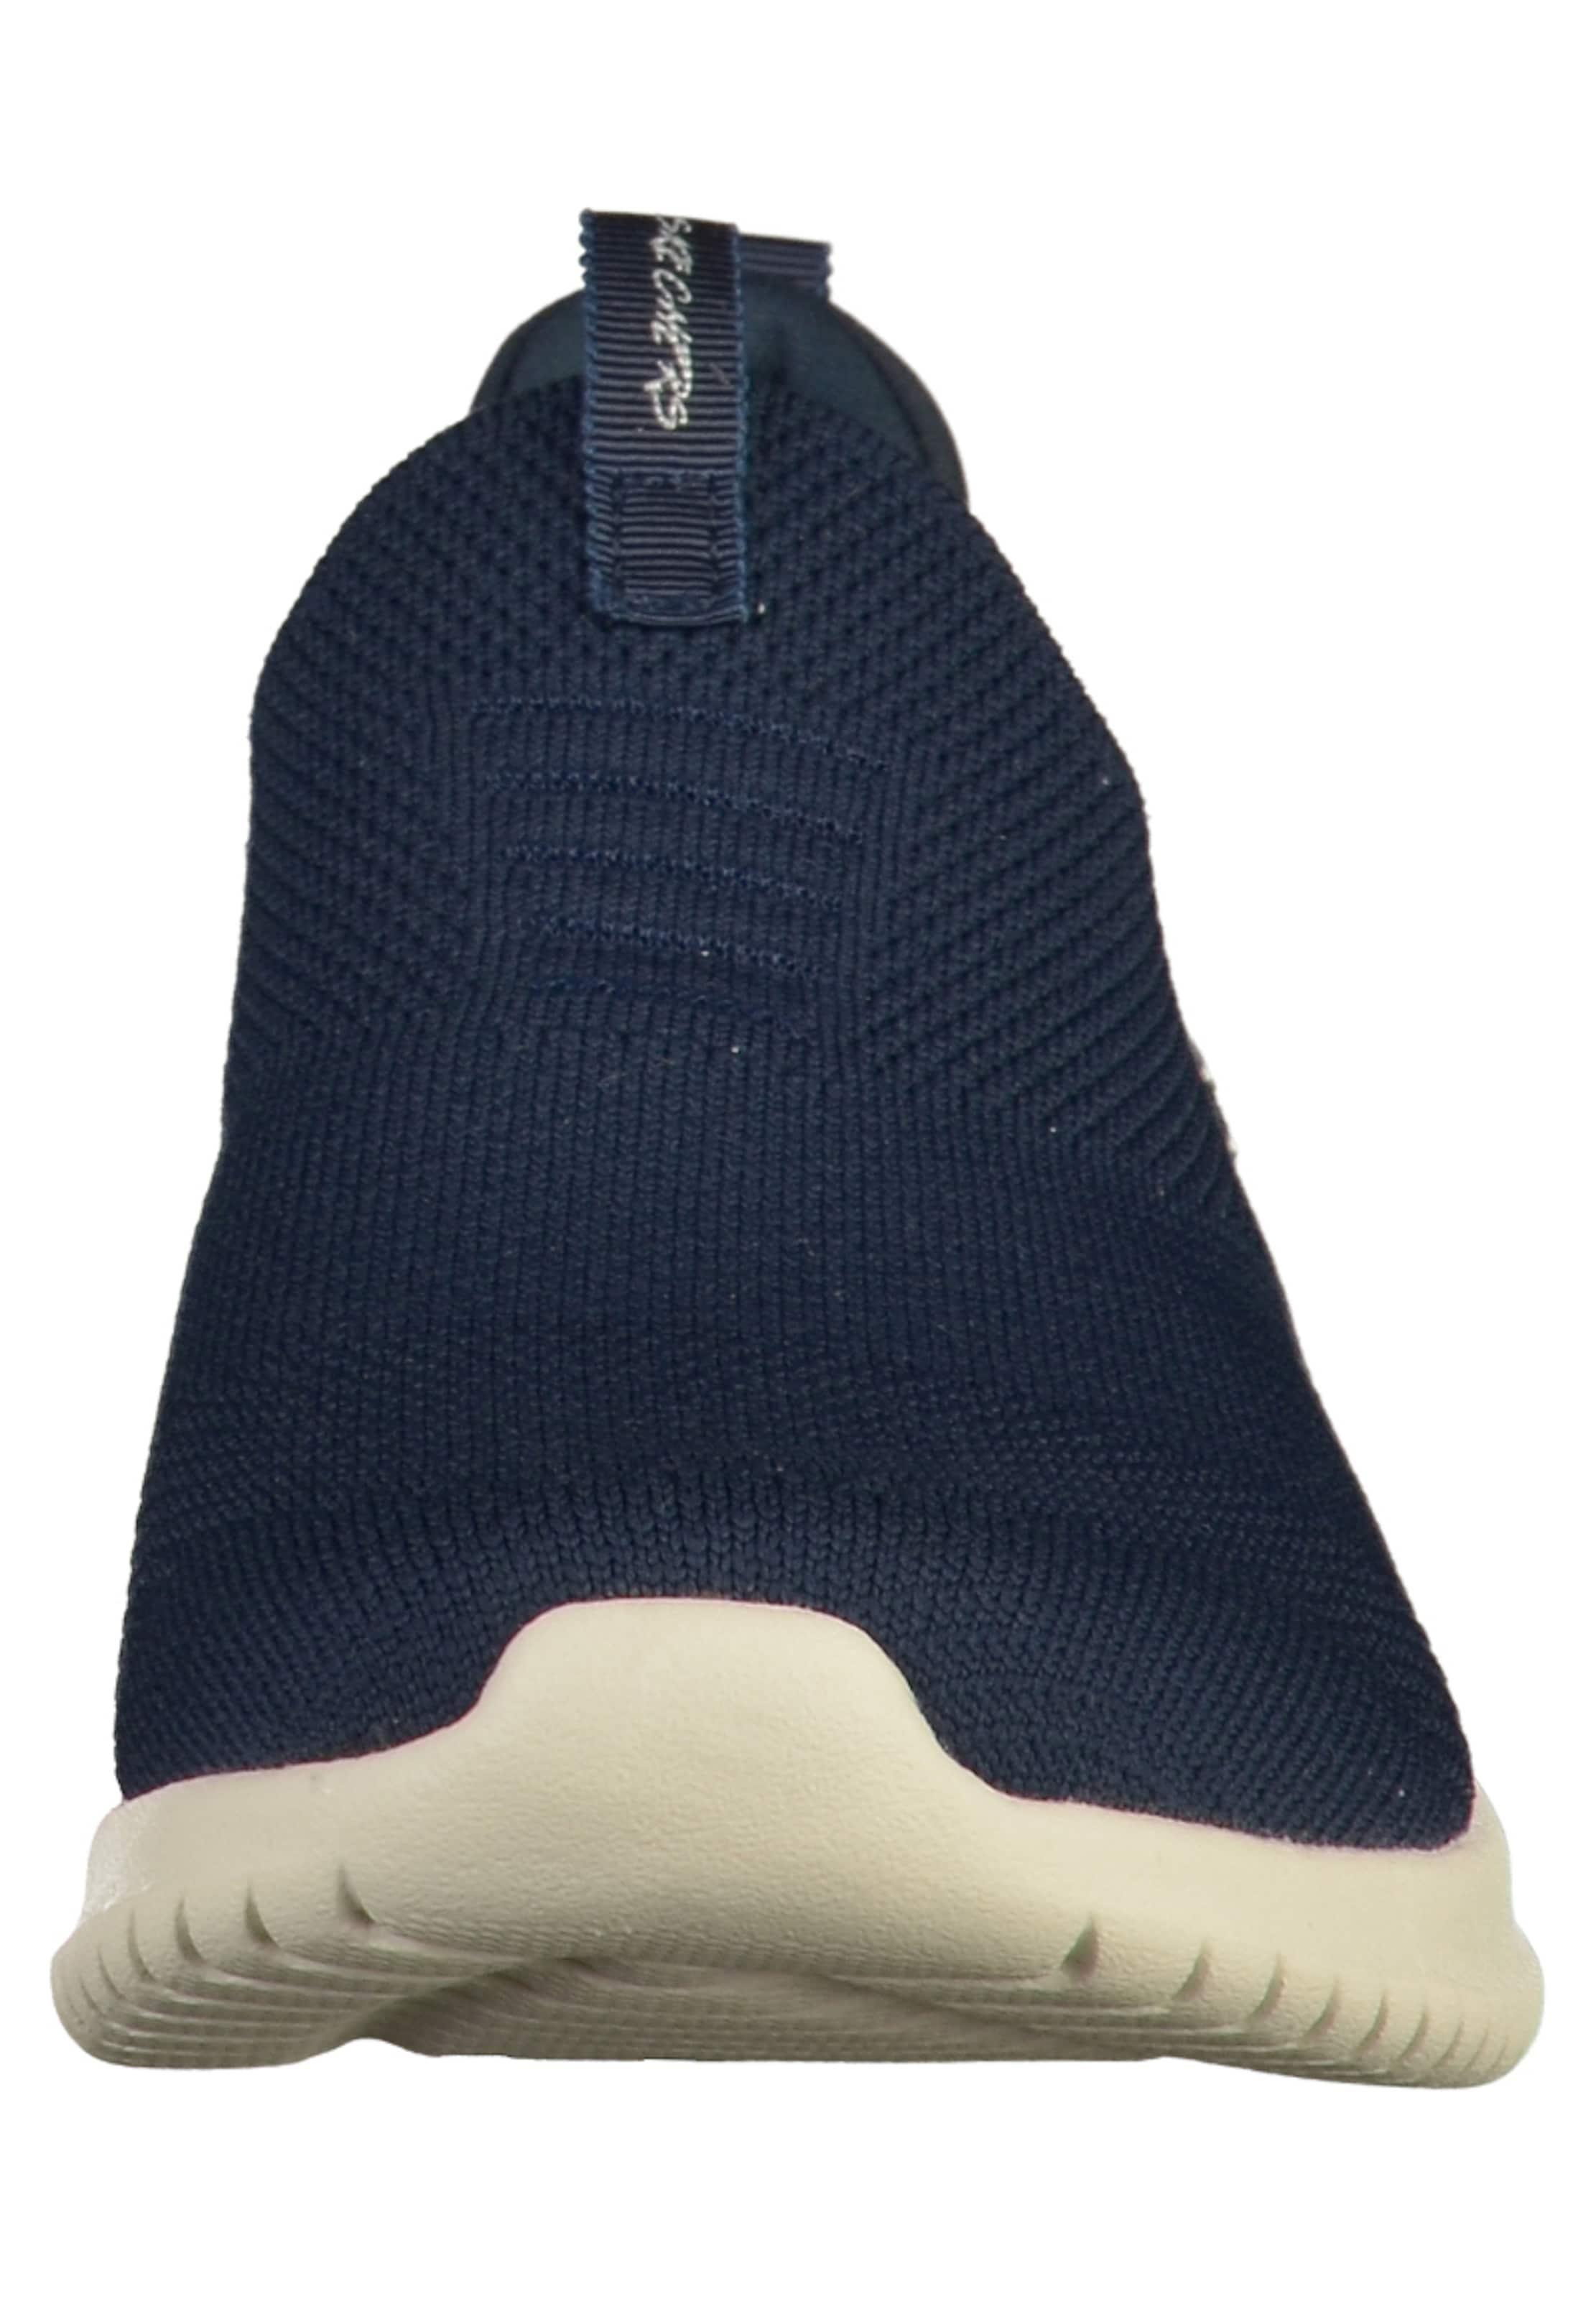 Skechers Skechers Sneaker Sneaker Blau Skechers In In Blau Skechers In Sneaker Sneaker Blau lJFK1c